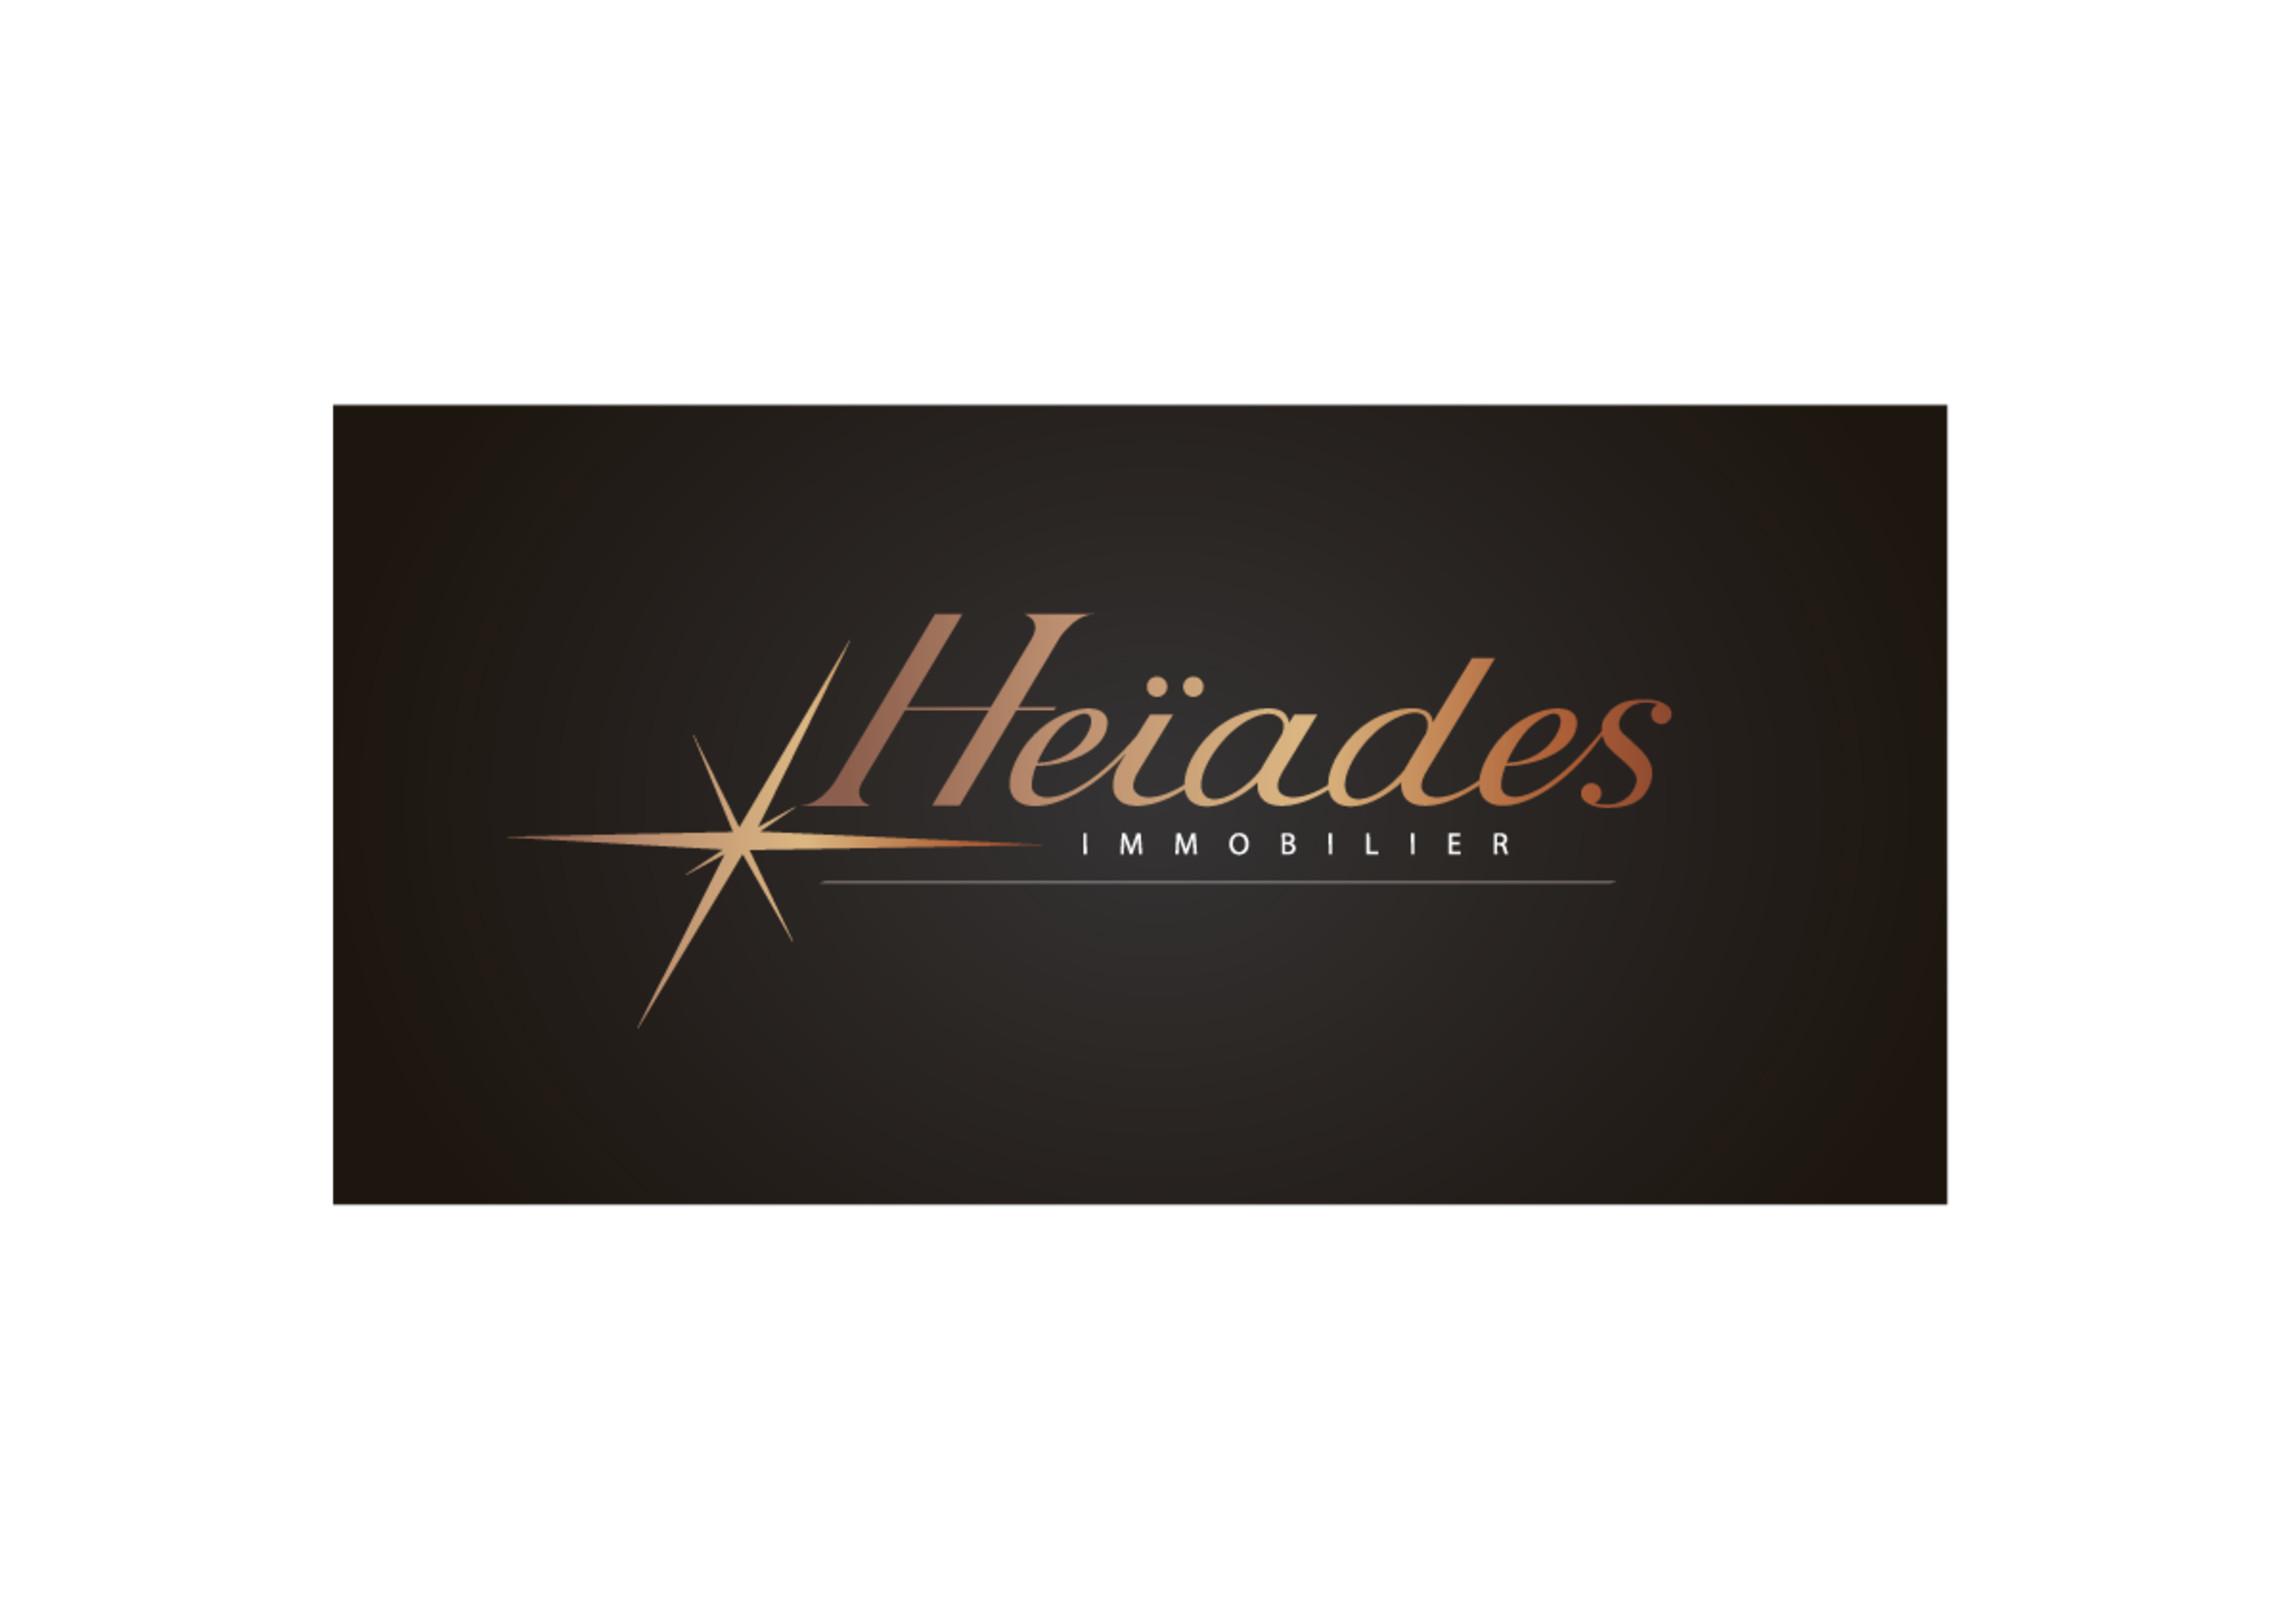 heiades immobilier- company logo